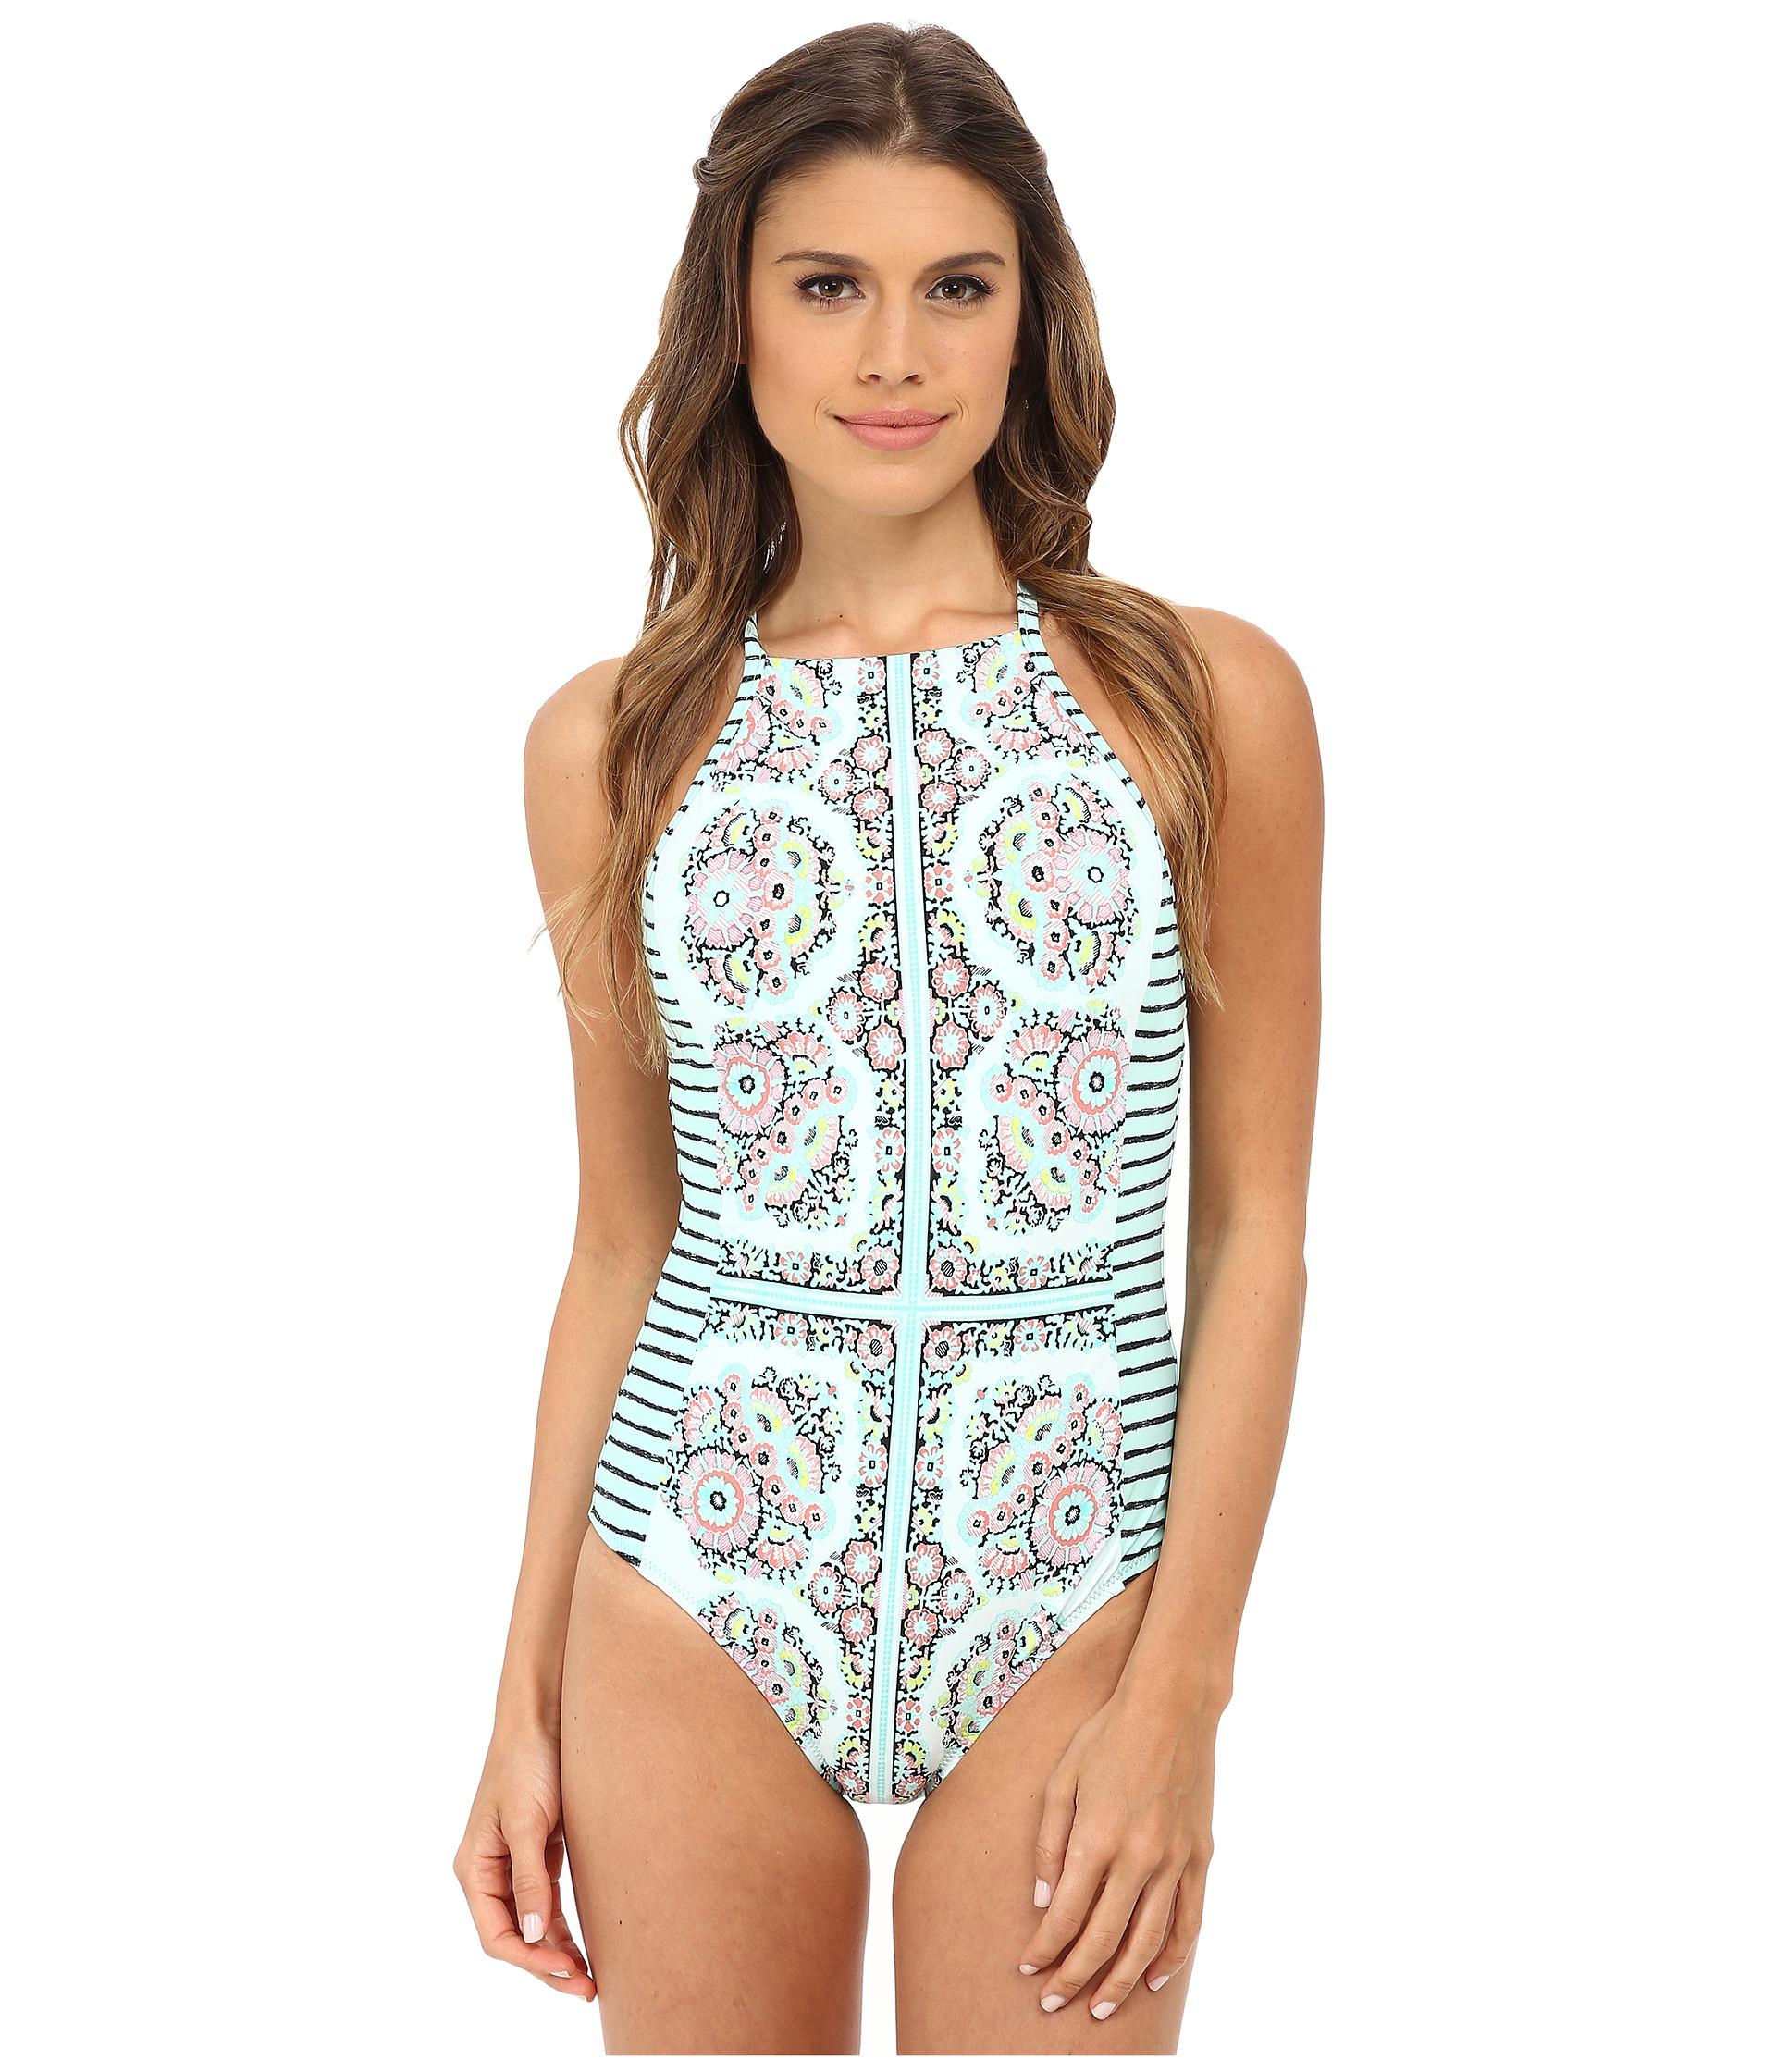 Nanette Lepore Montecito One Piece Swimsuits